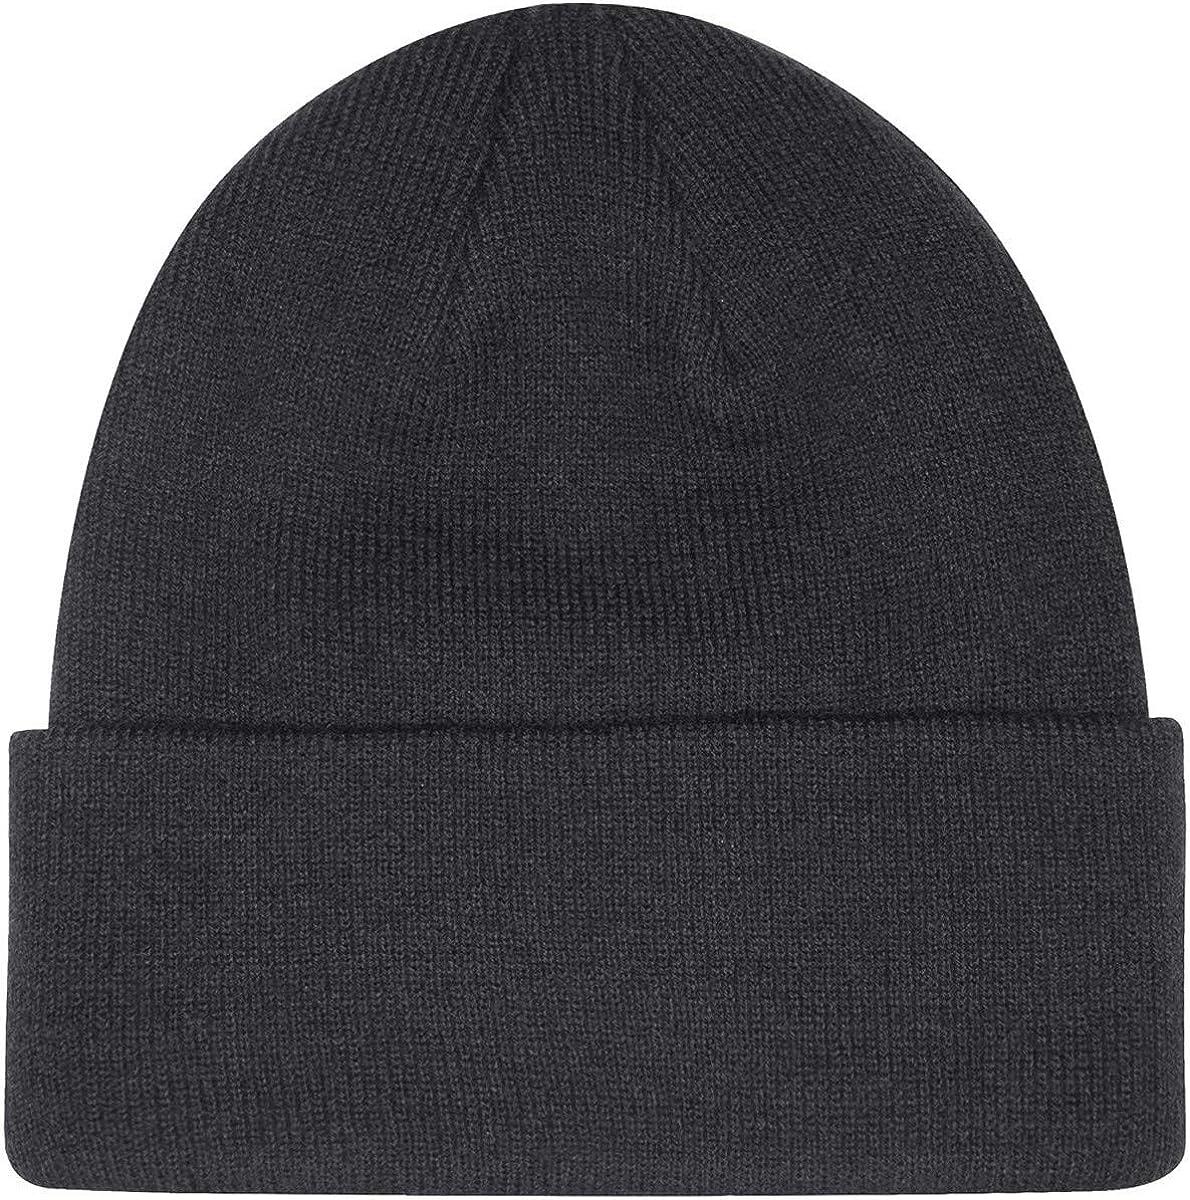 adidas Cuffed Knit Winter Beanie Hat